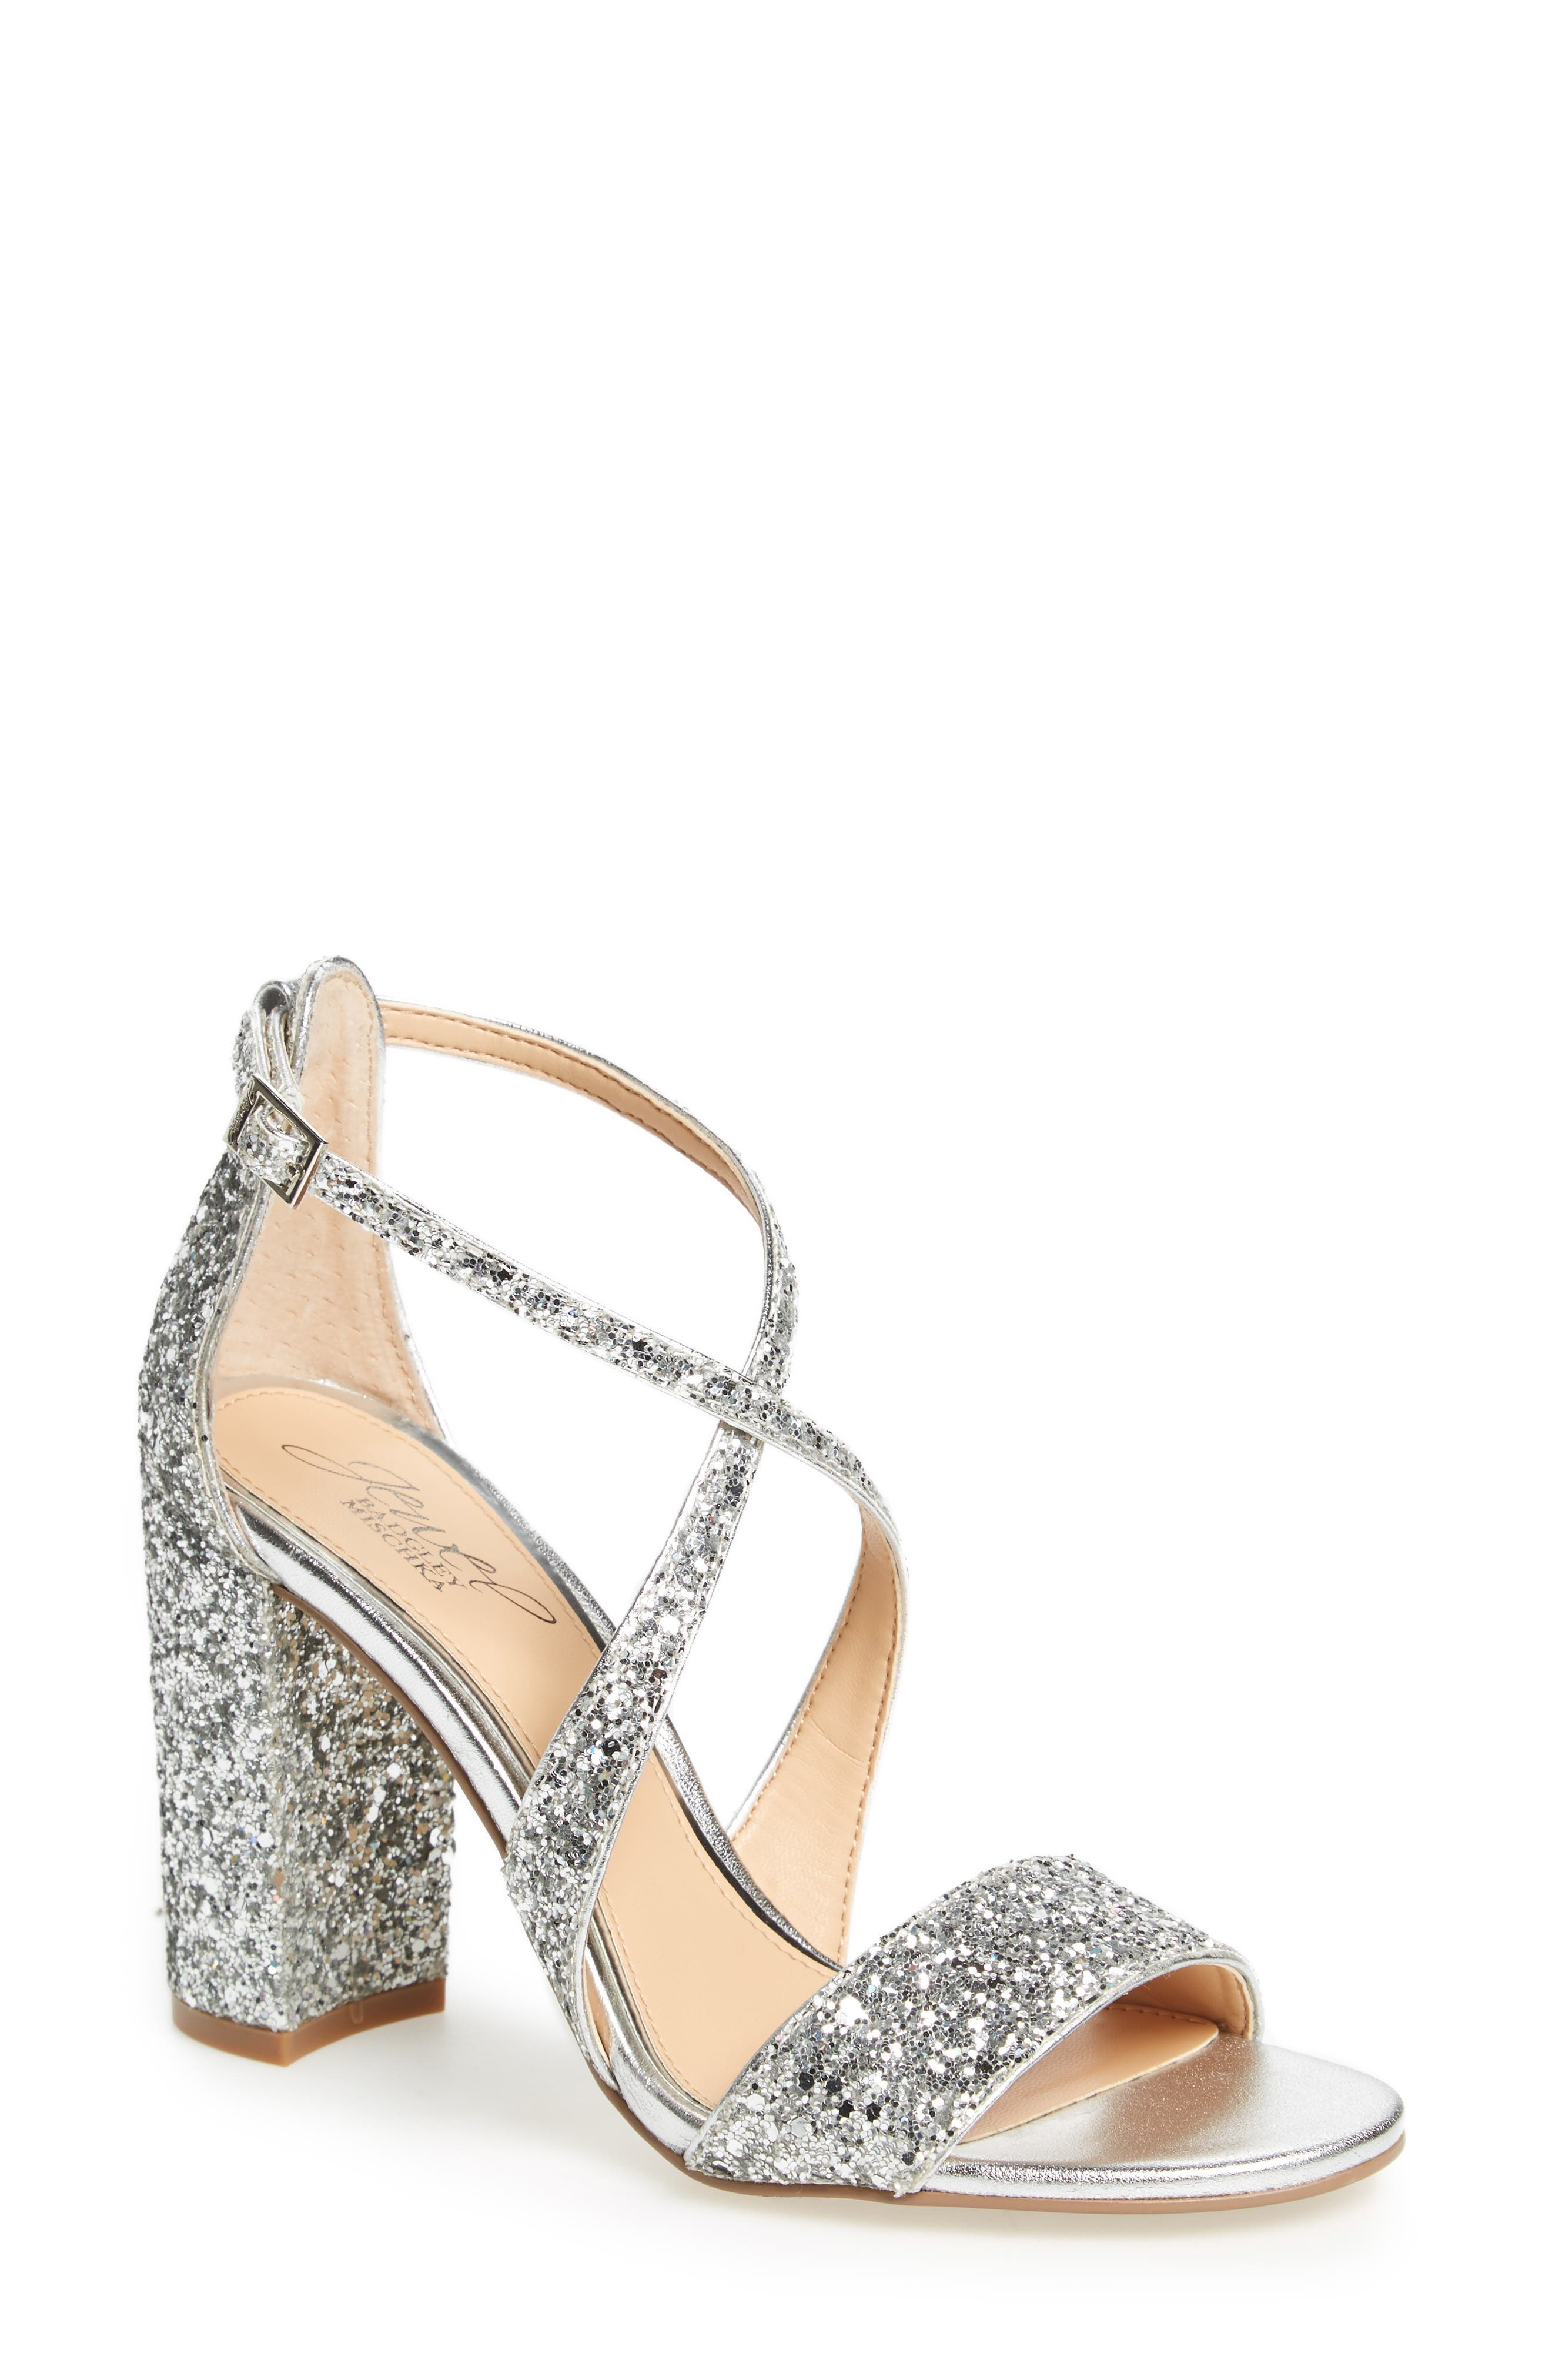 Main Image - Jewel Badgley Mischka Cook Block Heel Glitter Sandal (Women)